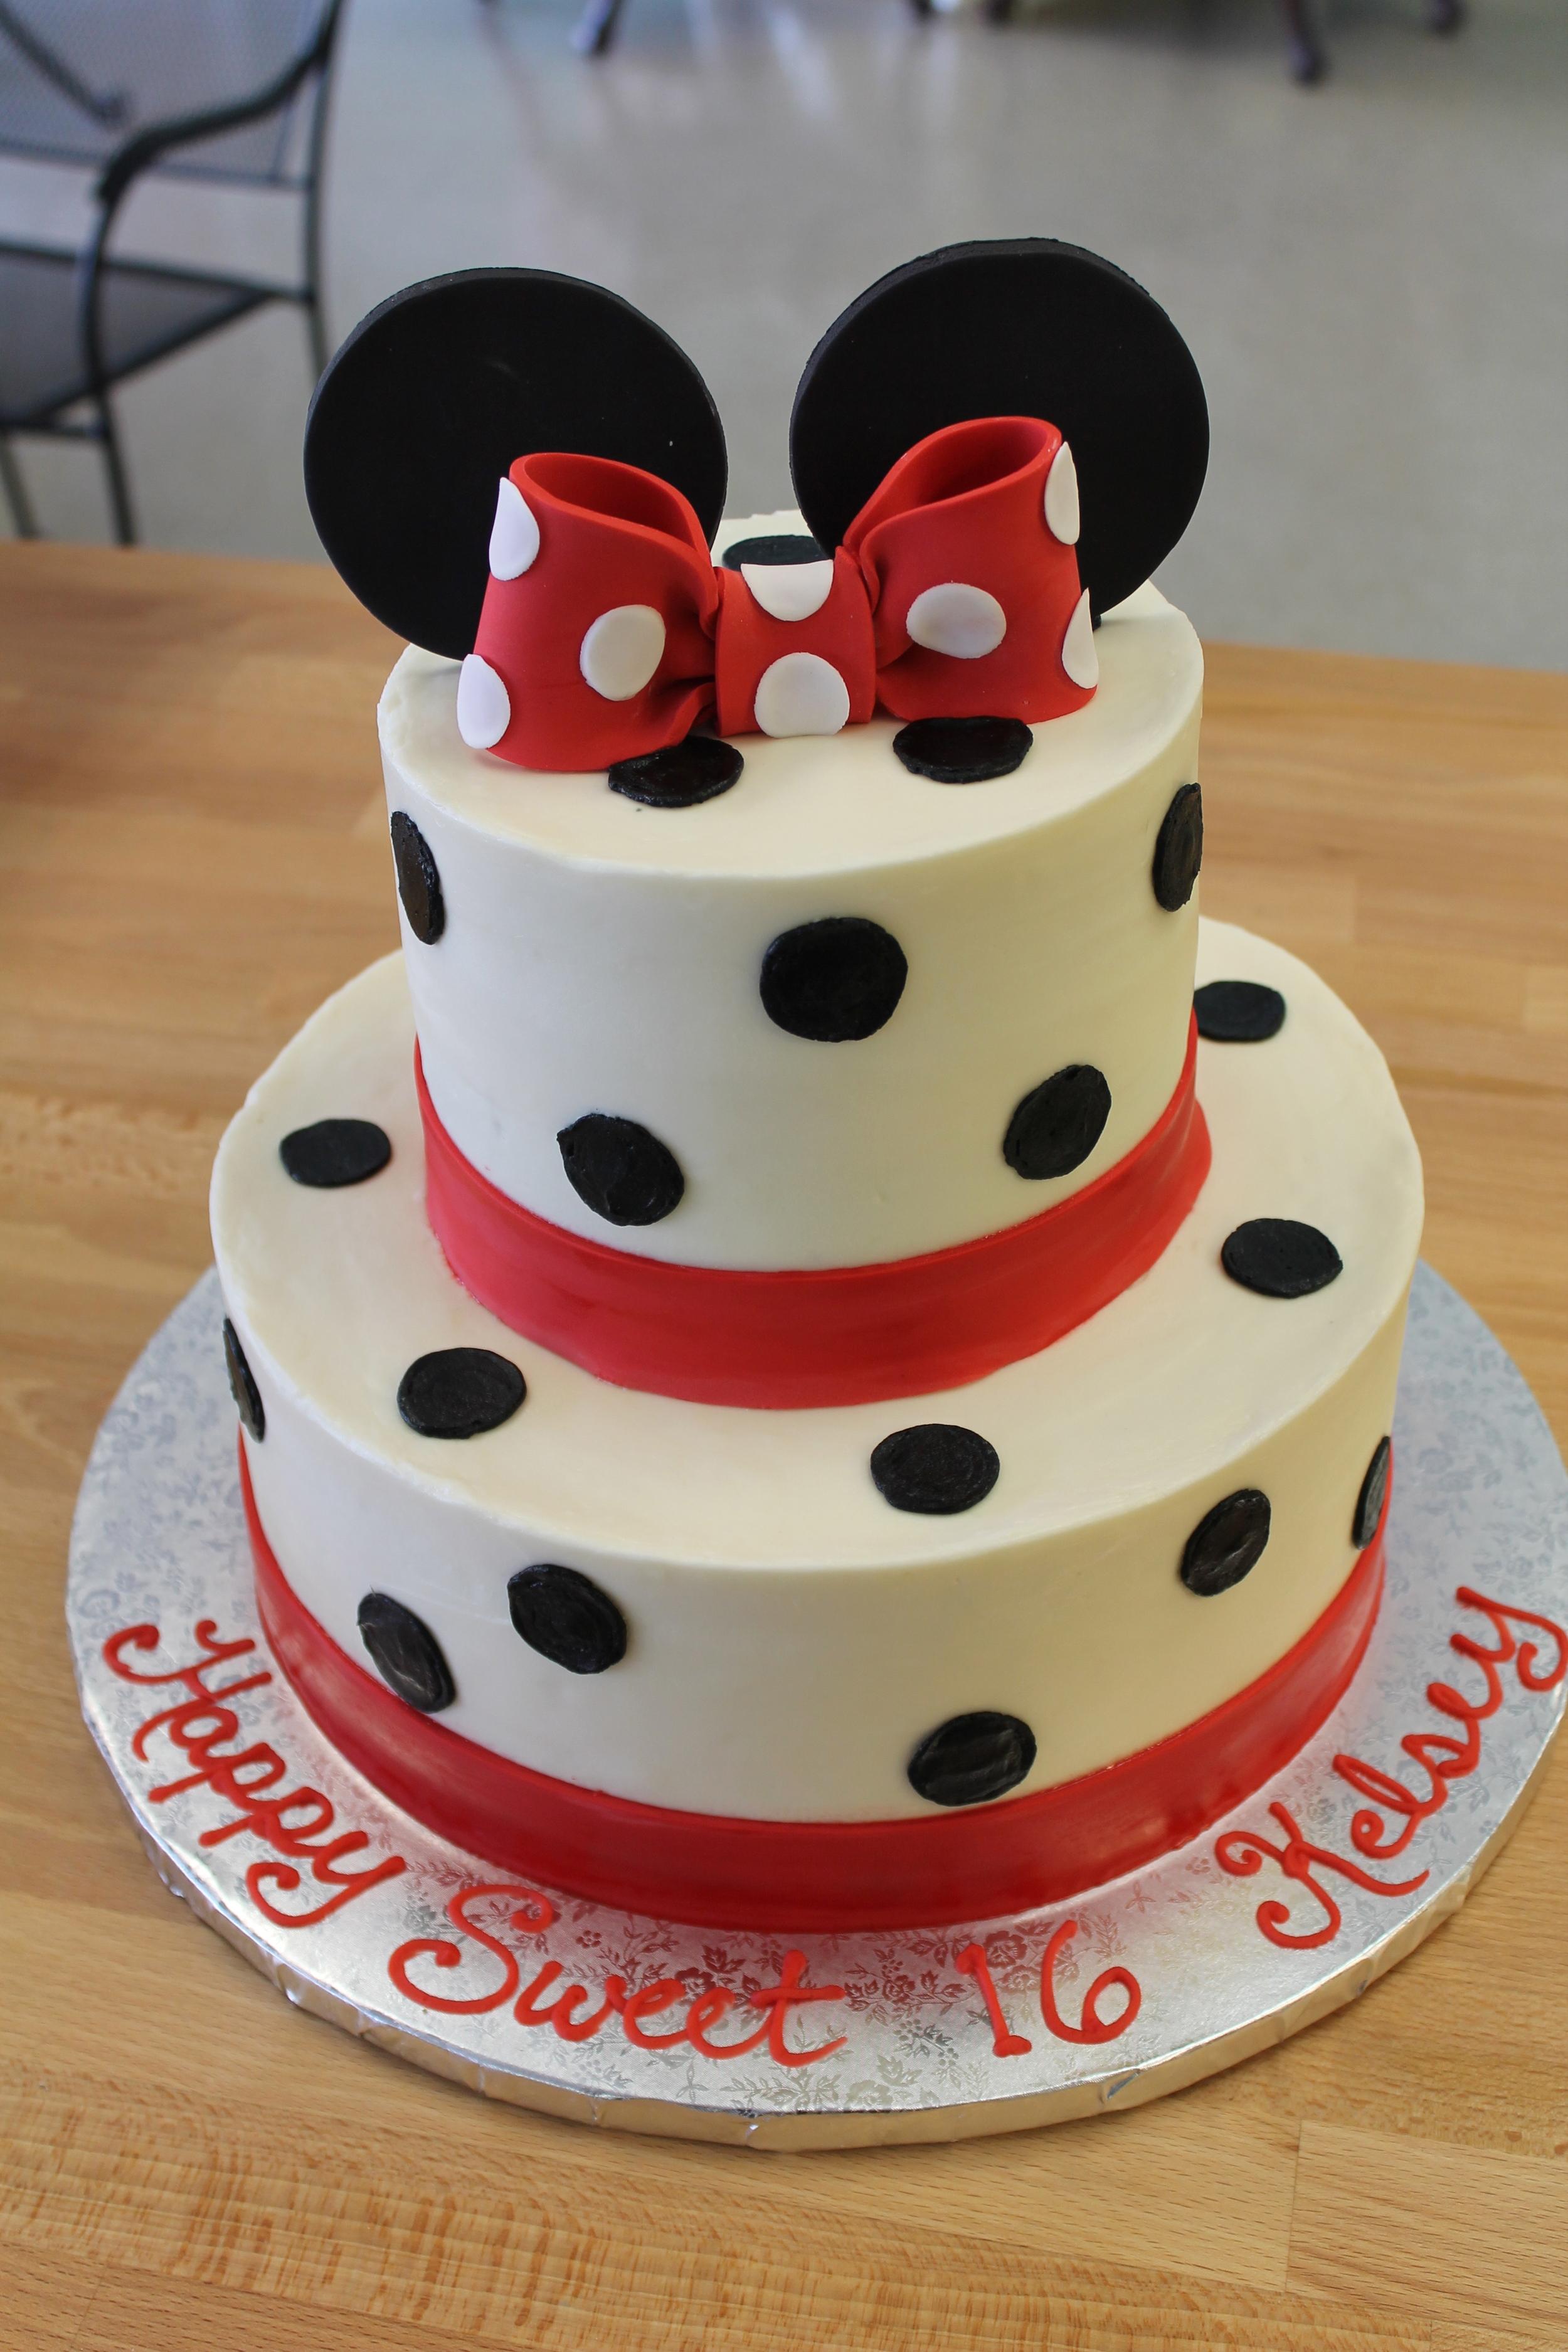 Black Polka Dots, Red Bow Cake